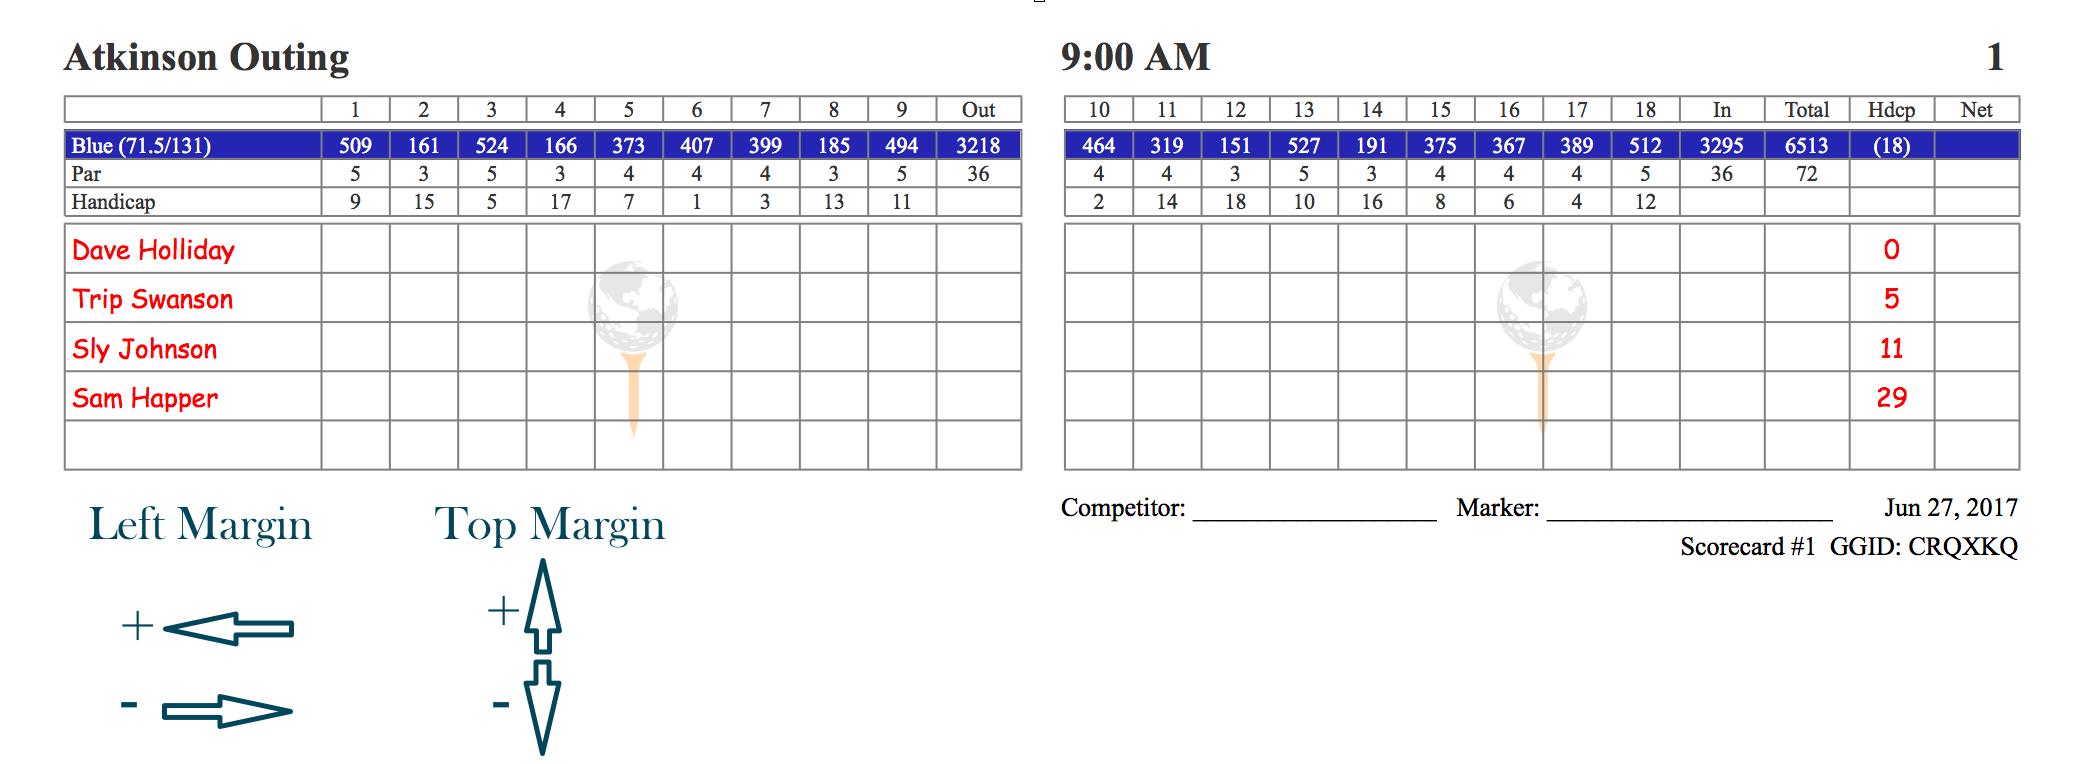 image relating to Printable Golf Scorecard called Golfgenius - Printing Scorecards (Structure tab)